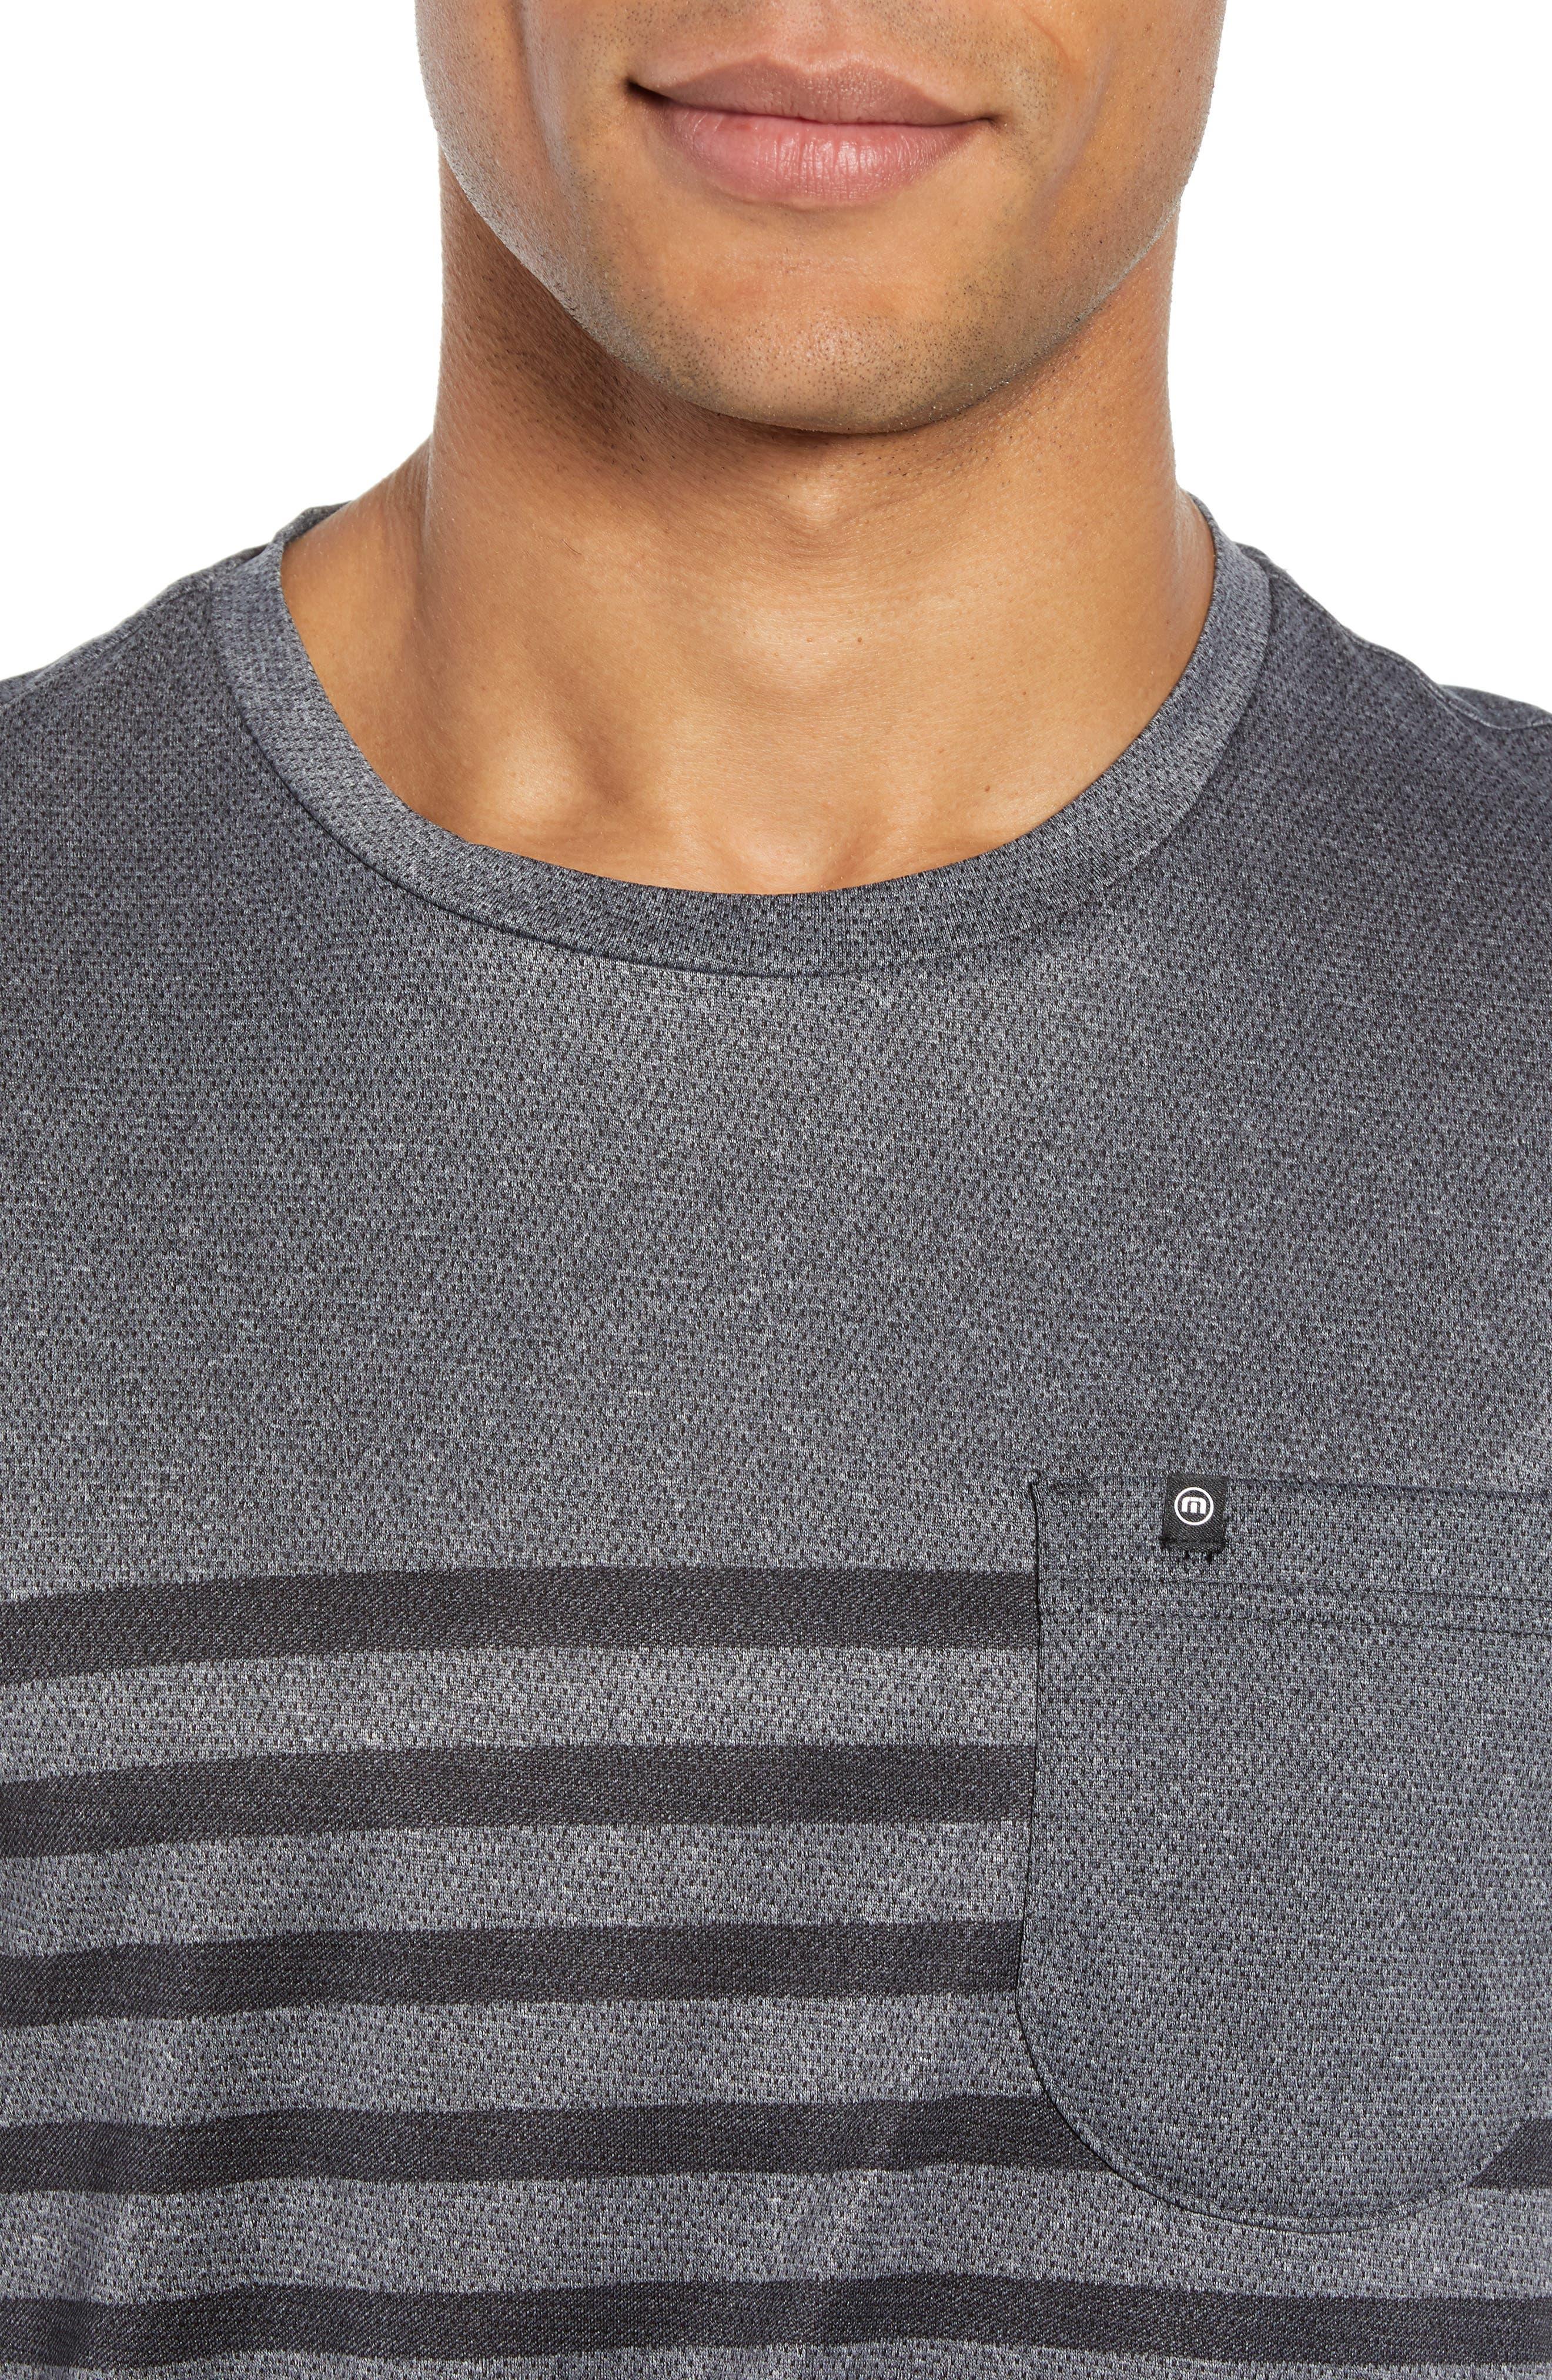 Cutoff Pocket T-Shirt,                             Alternate thumbnail 4, color,                             HEATHER MAGNET